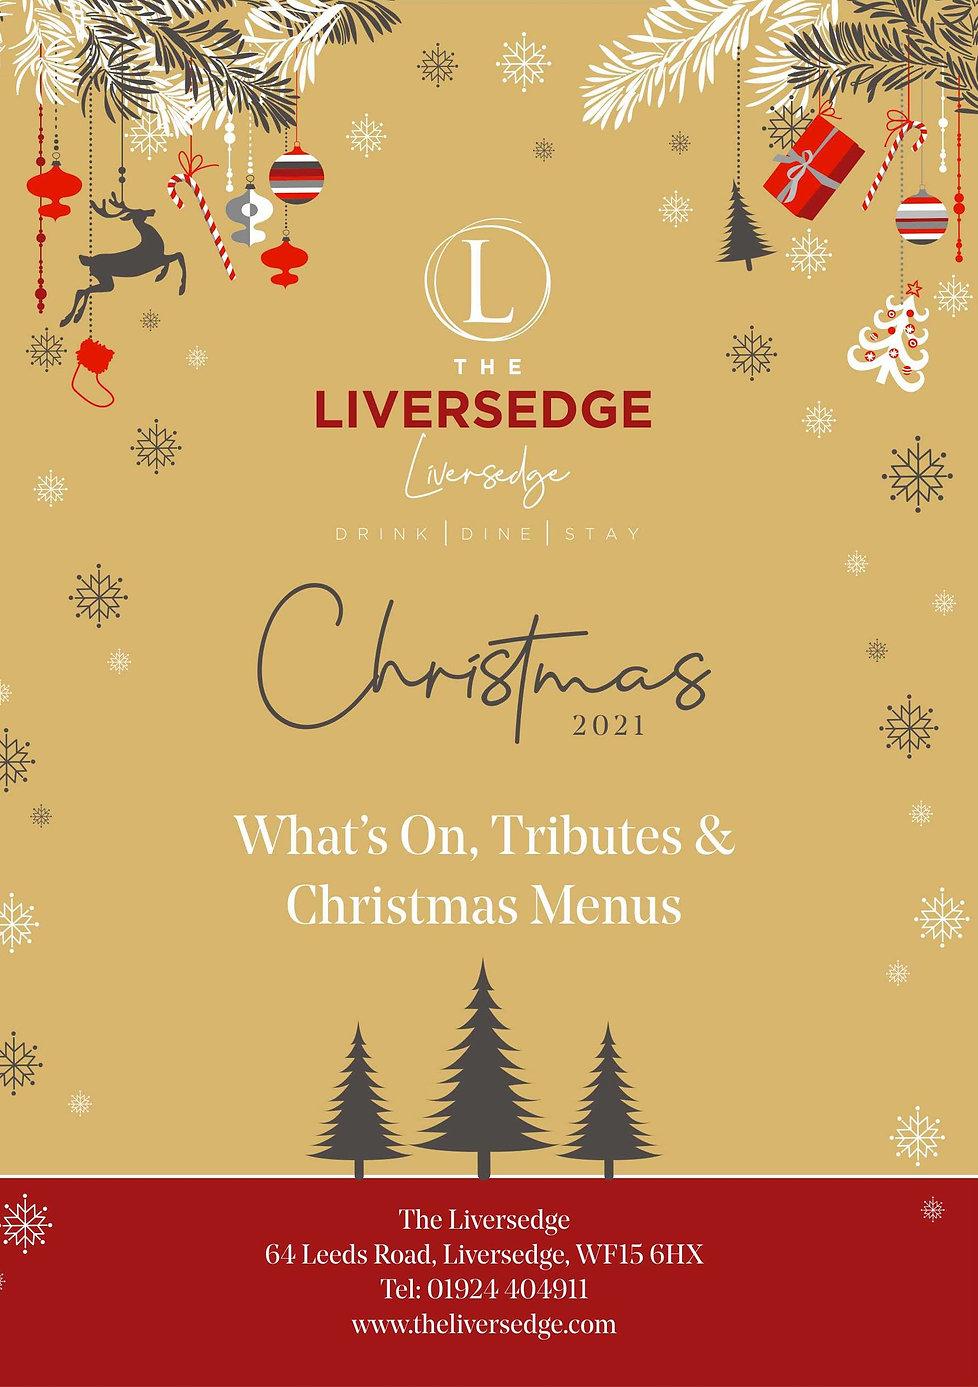 Liversedge xmas booklet outer - Copy.jpg